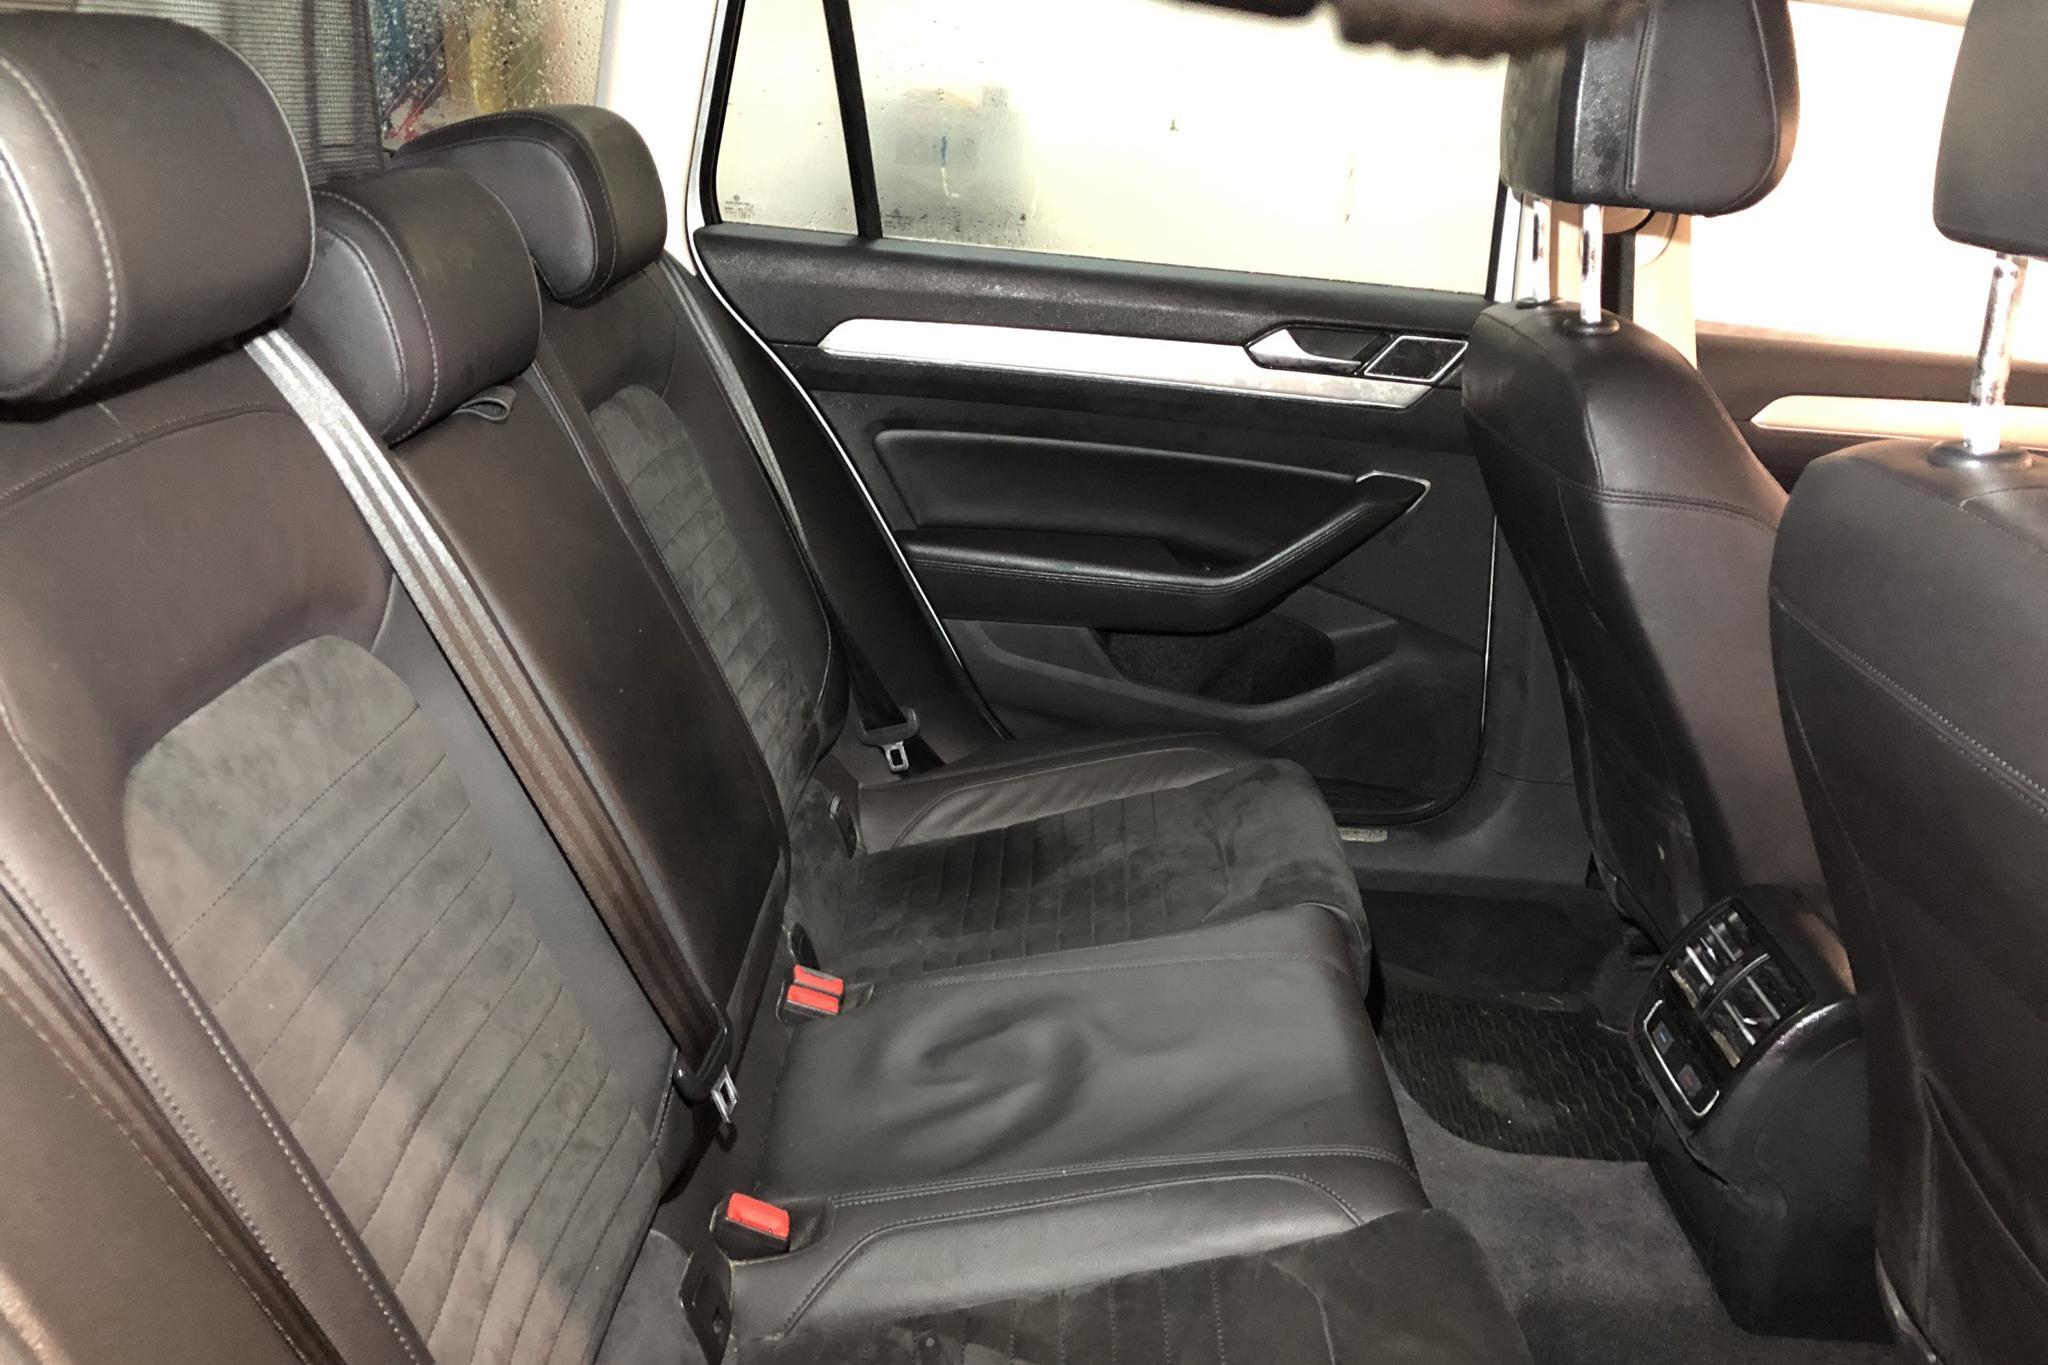 VW Passat 1.4 Plug-in-Hybrid Sportscombi (218hk) - 17 501 mil - Automat - vit - 2018